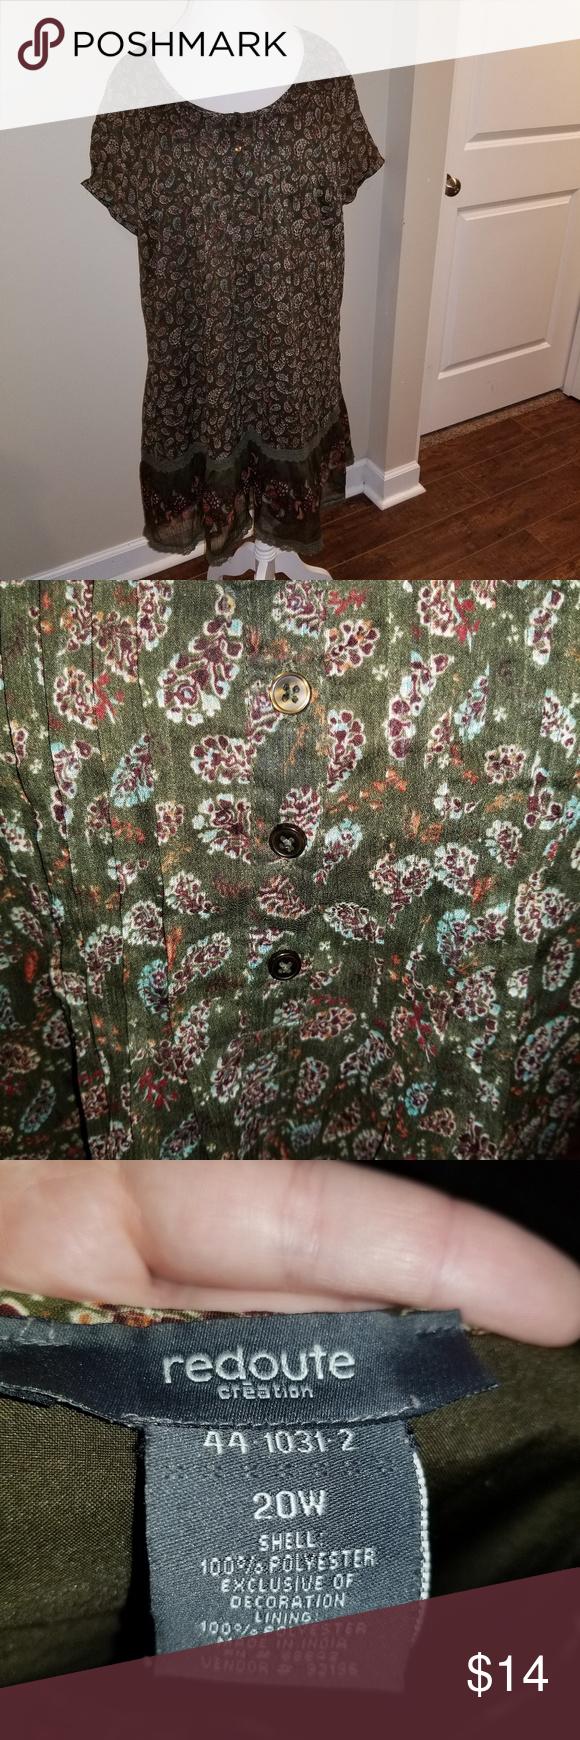 Plus size flowy dress beautiful flowy olive green dress from redoute